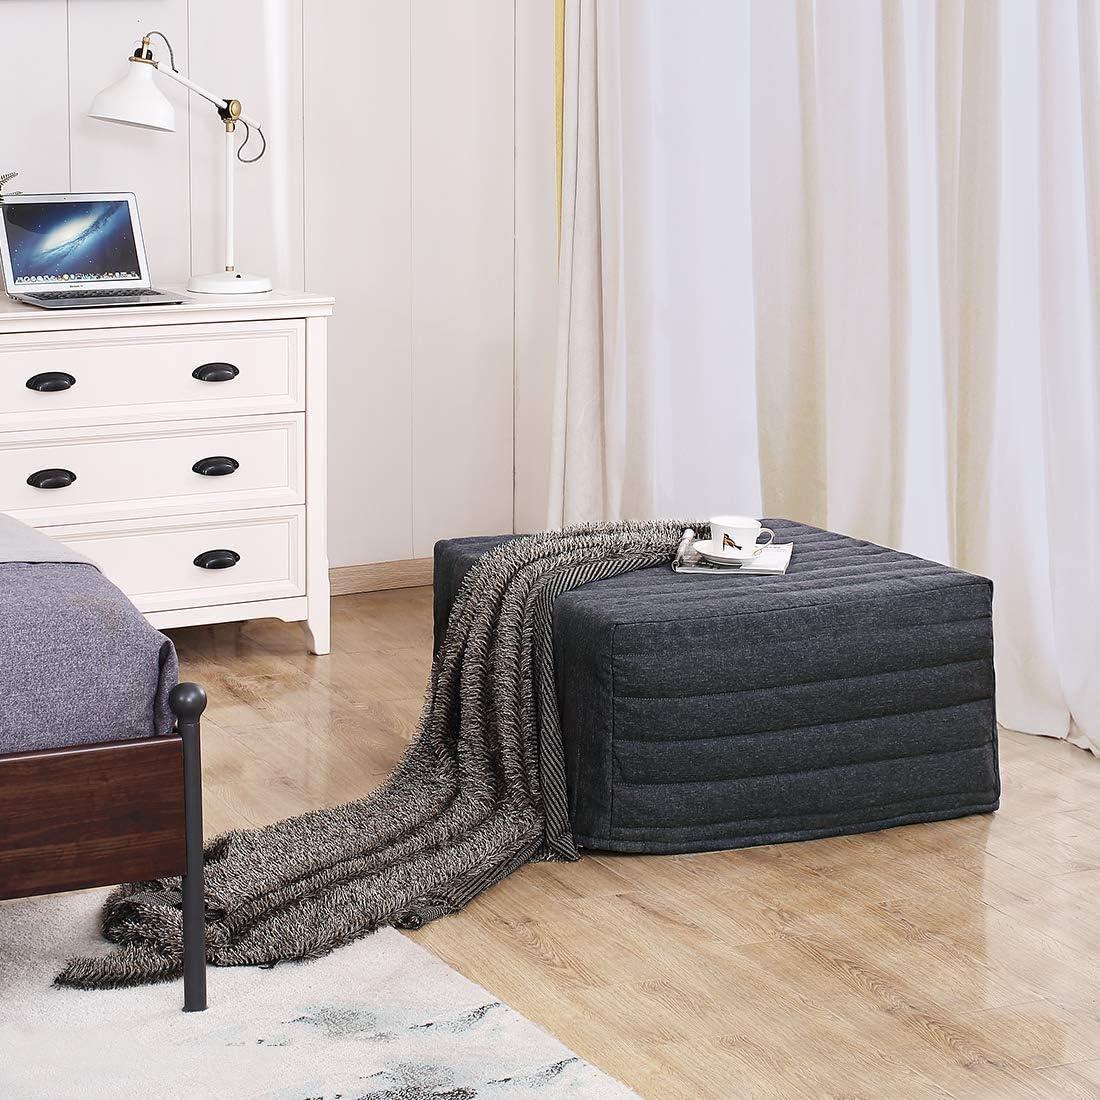 TATAGO Dual Use Ottoman Folding Bed